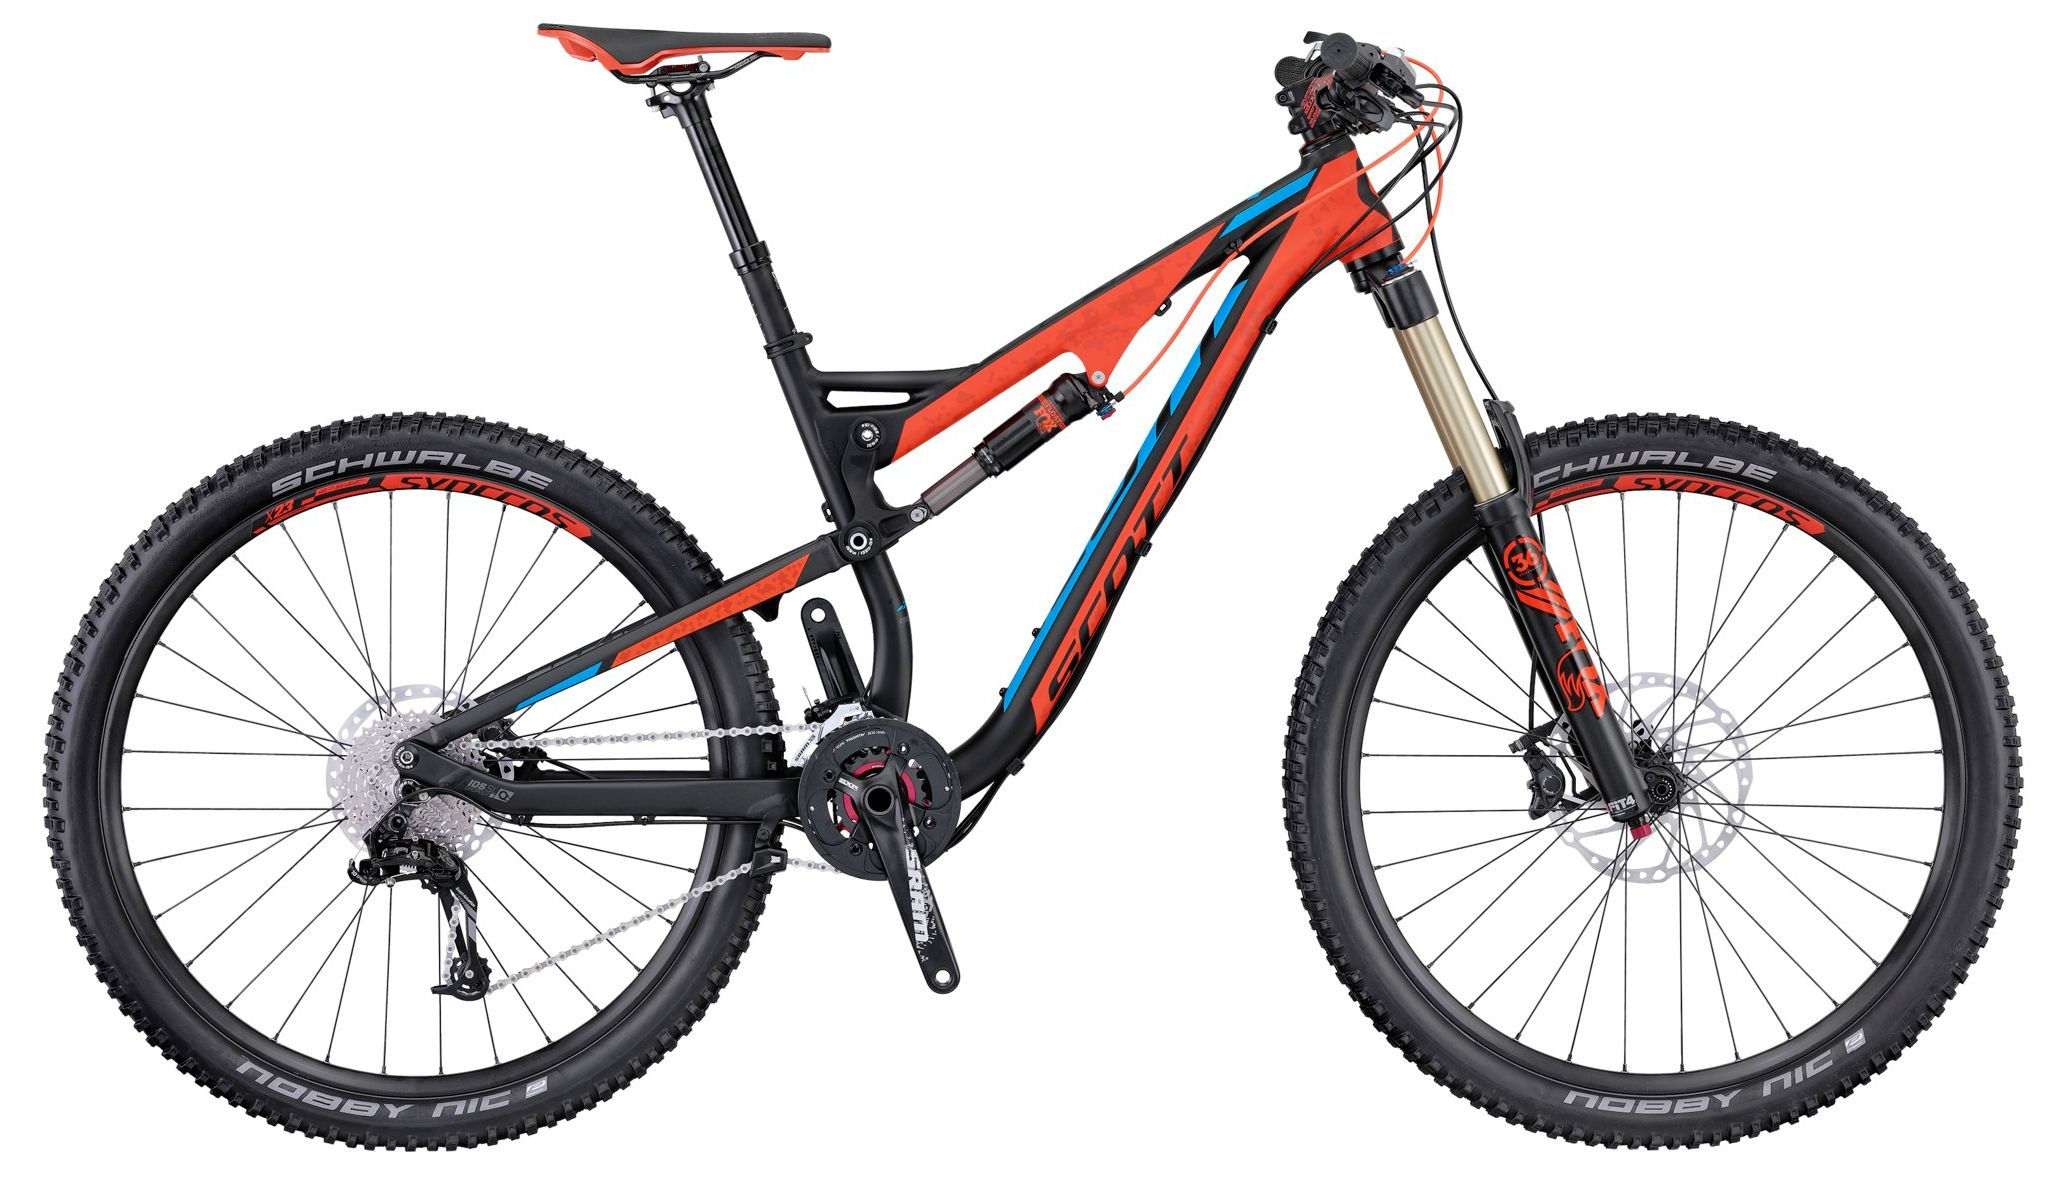 Велосипед Scott Genius LT 720 2016 велосипед scott genius lt 720 2015